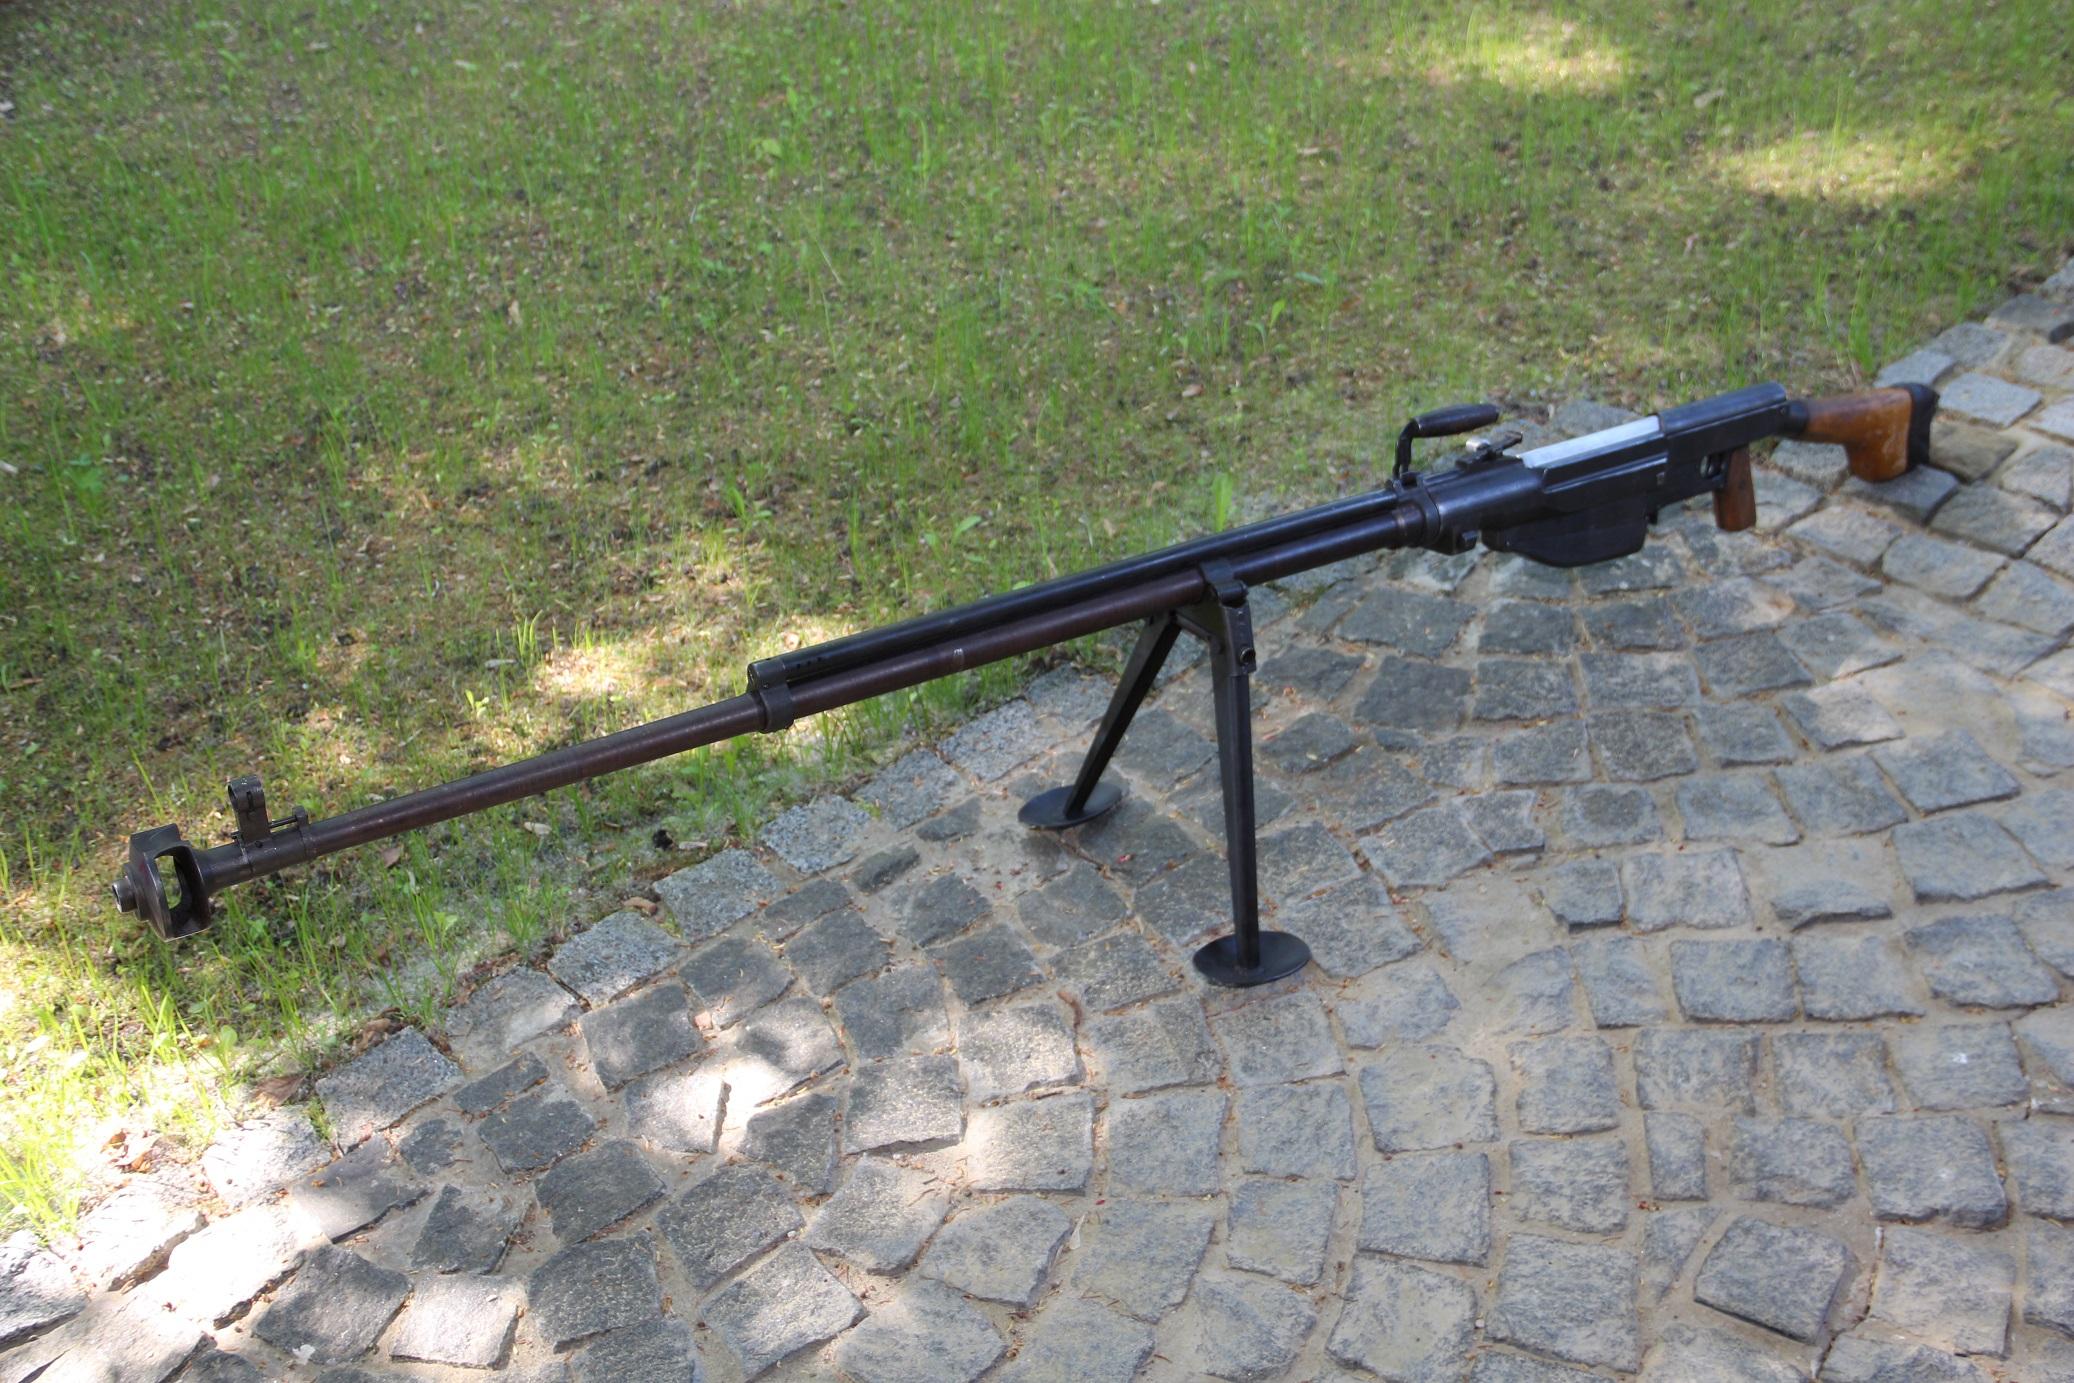 Фото Противотанковое ружье Симонова ПТРС, 1943 год, №ДР147